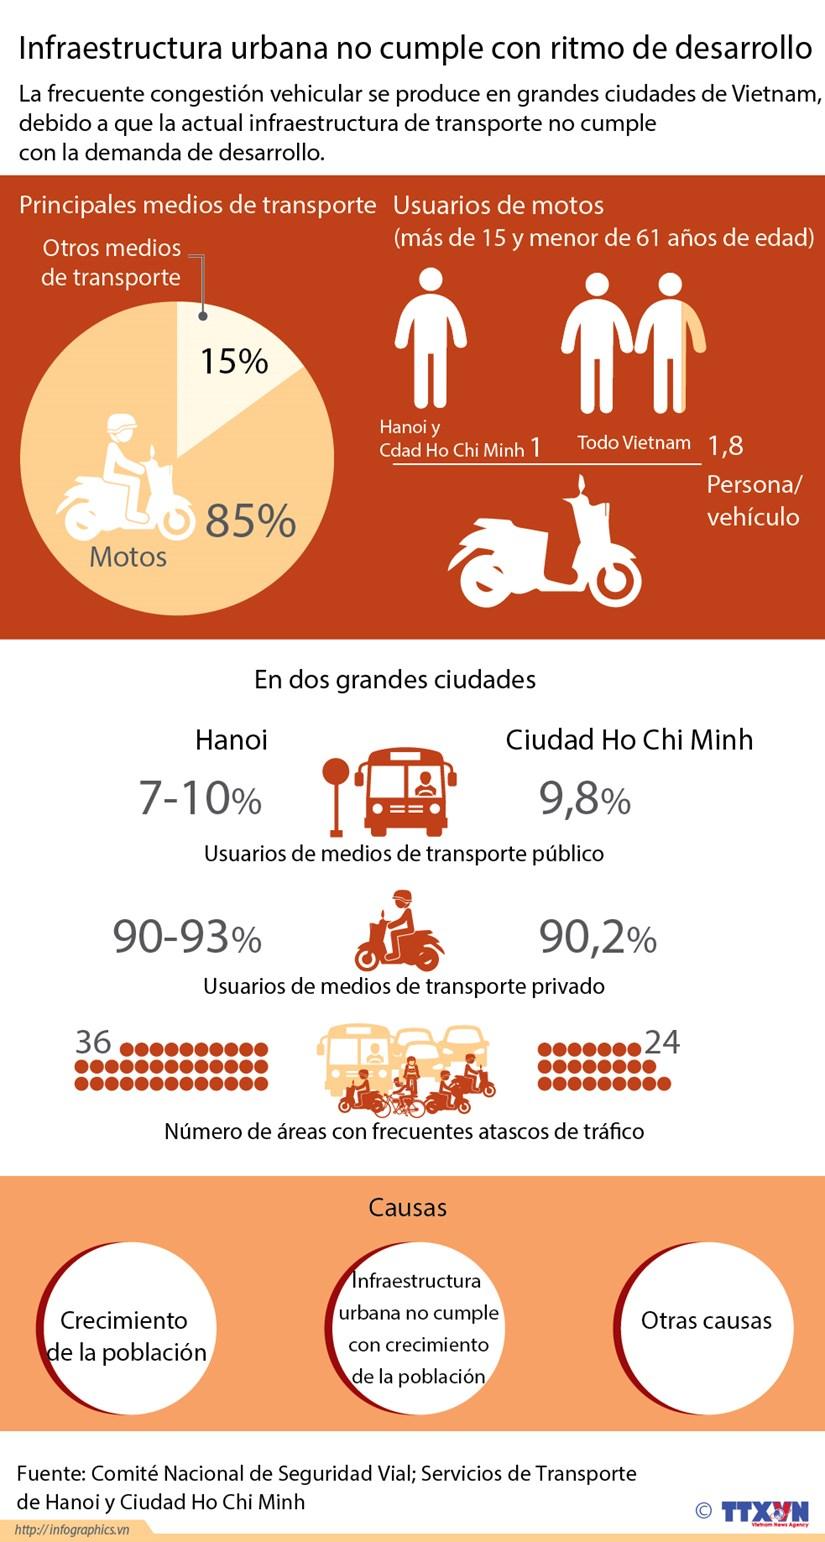 [Infografia] Infraestructura urbana no cumple con ritmo de desarrollo hinh anh 1